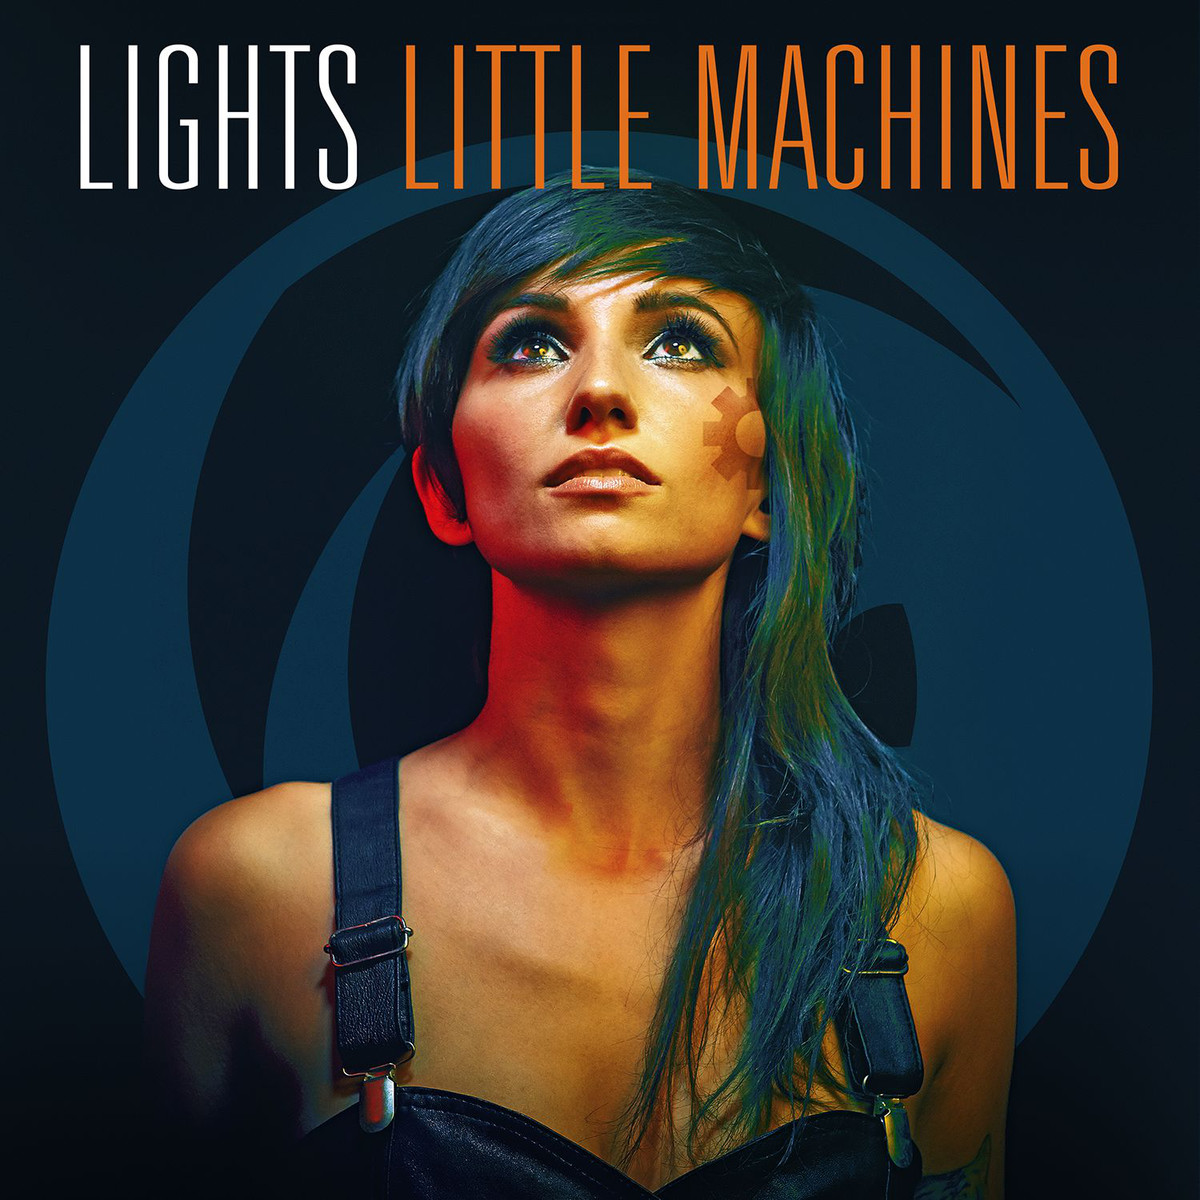 Lights-Little-Machines-2014-1200x1200.png